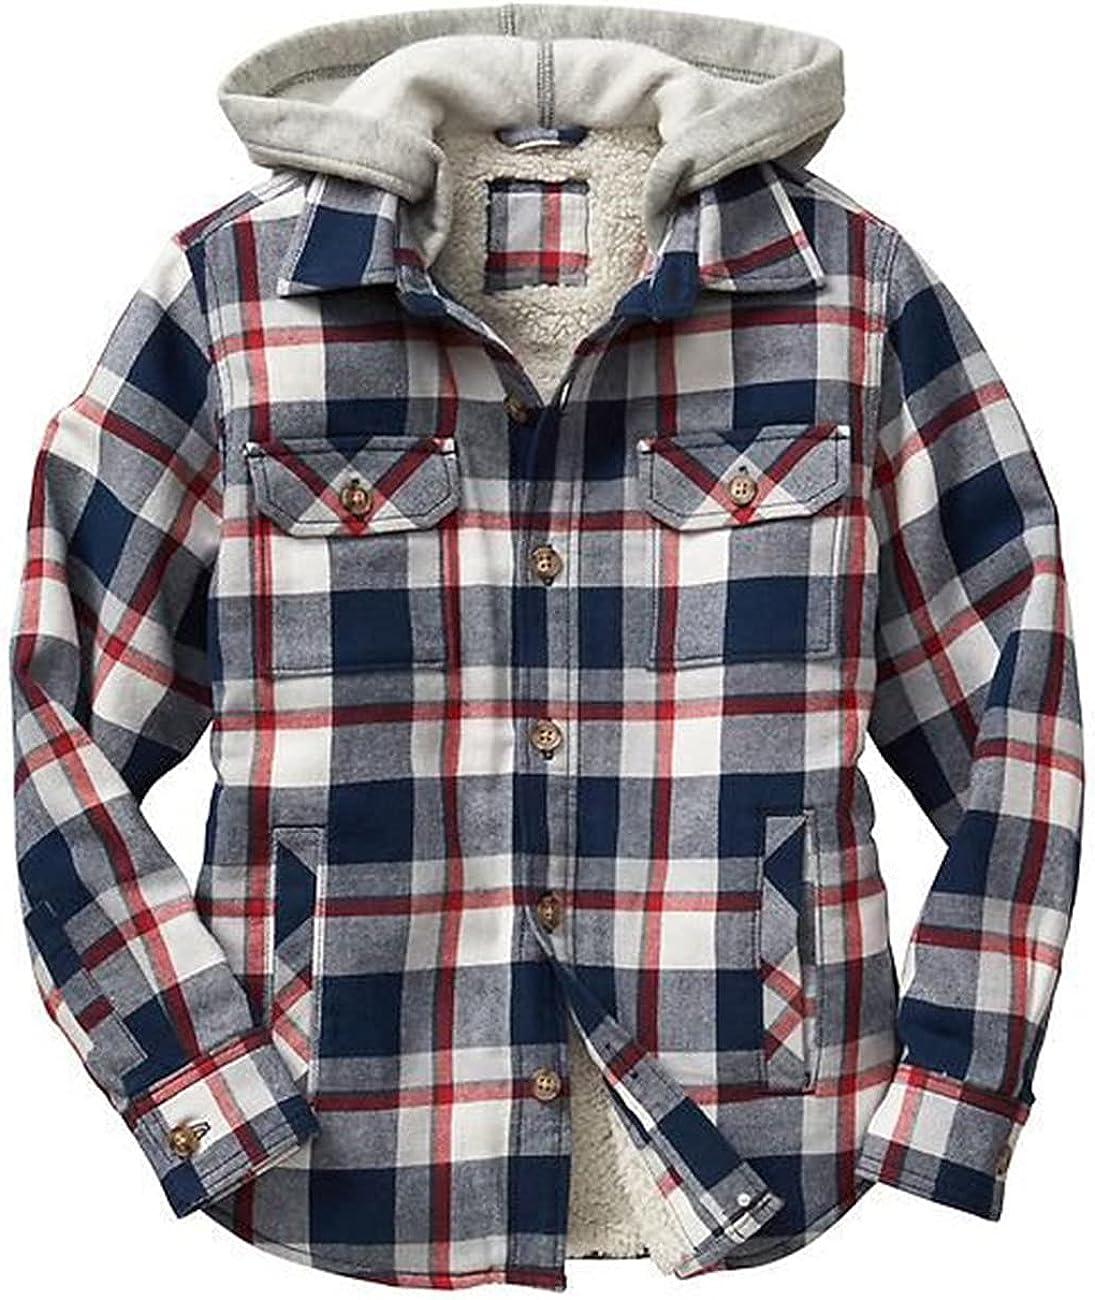 Men's Hooded Long Sleeve Thick Fleece Fake 2pcs Plaids Design Casual Fashion Outwear Jackets